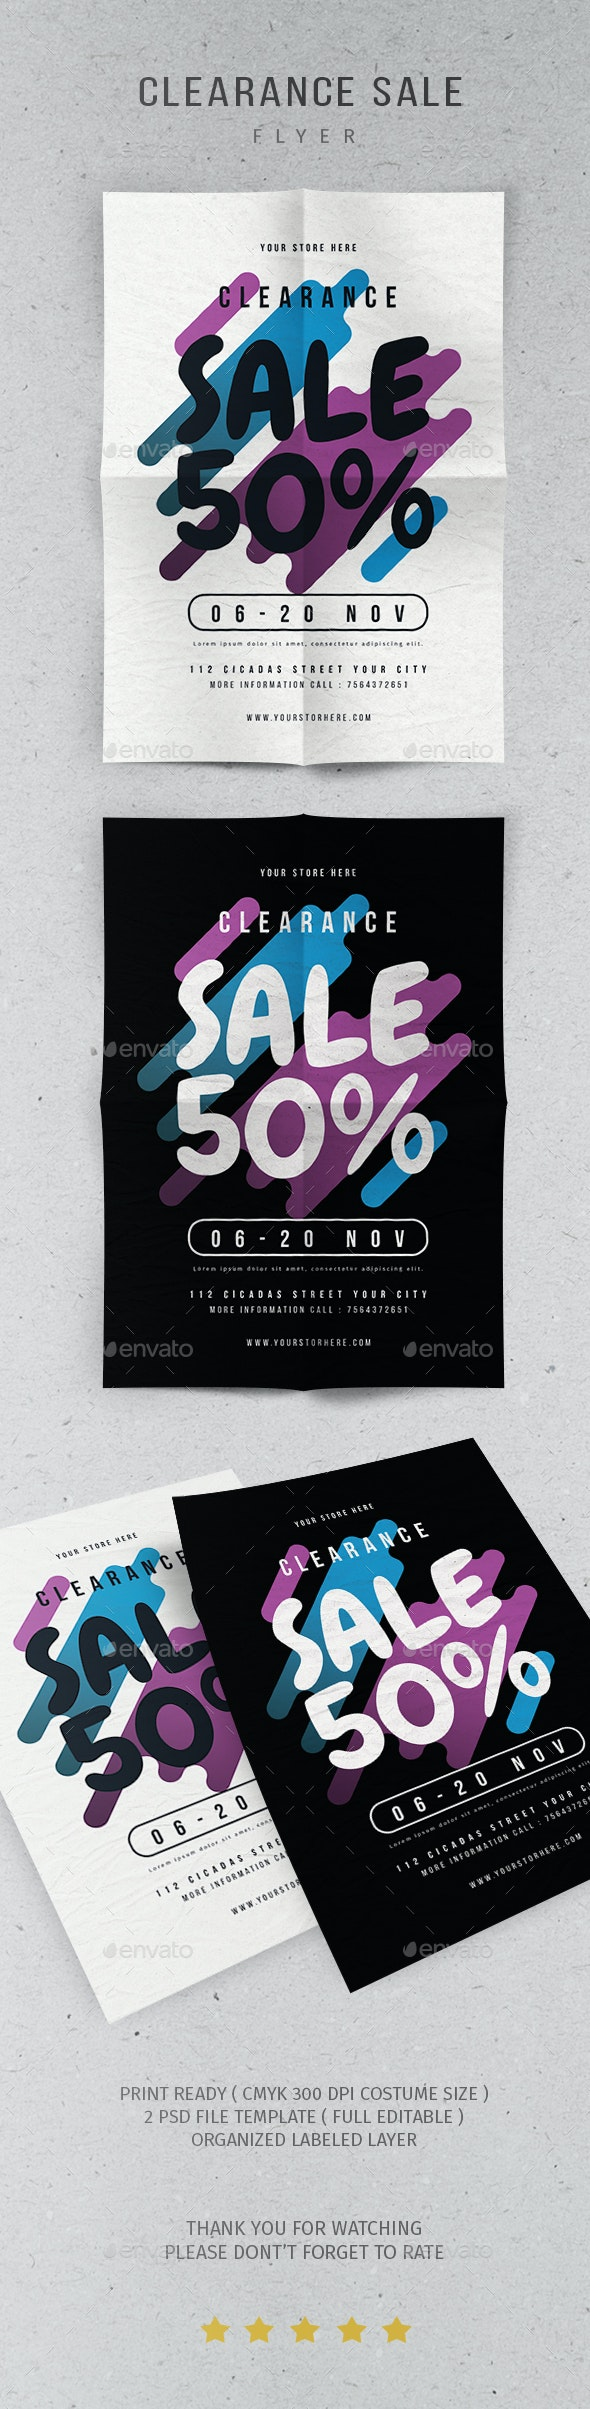 Clearance Sale Flyer - Flyers Print Templates